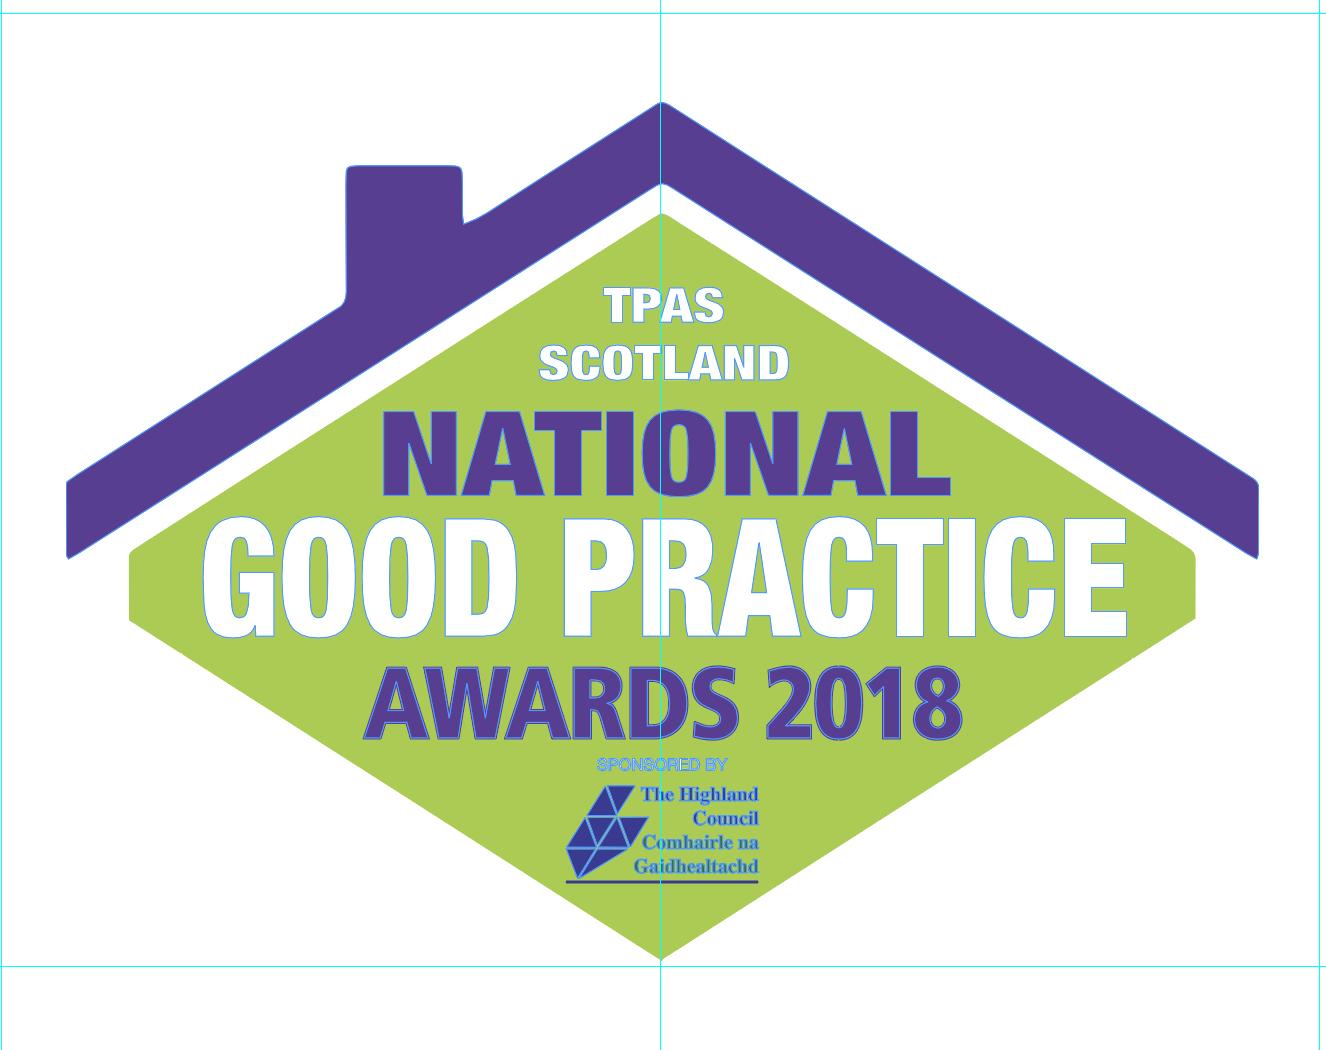 Good Practice Awards 2018